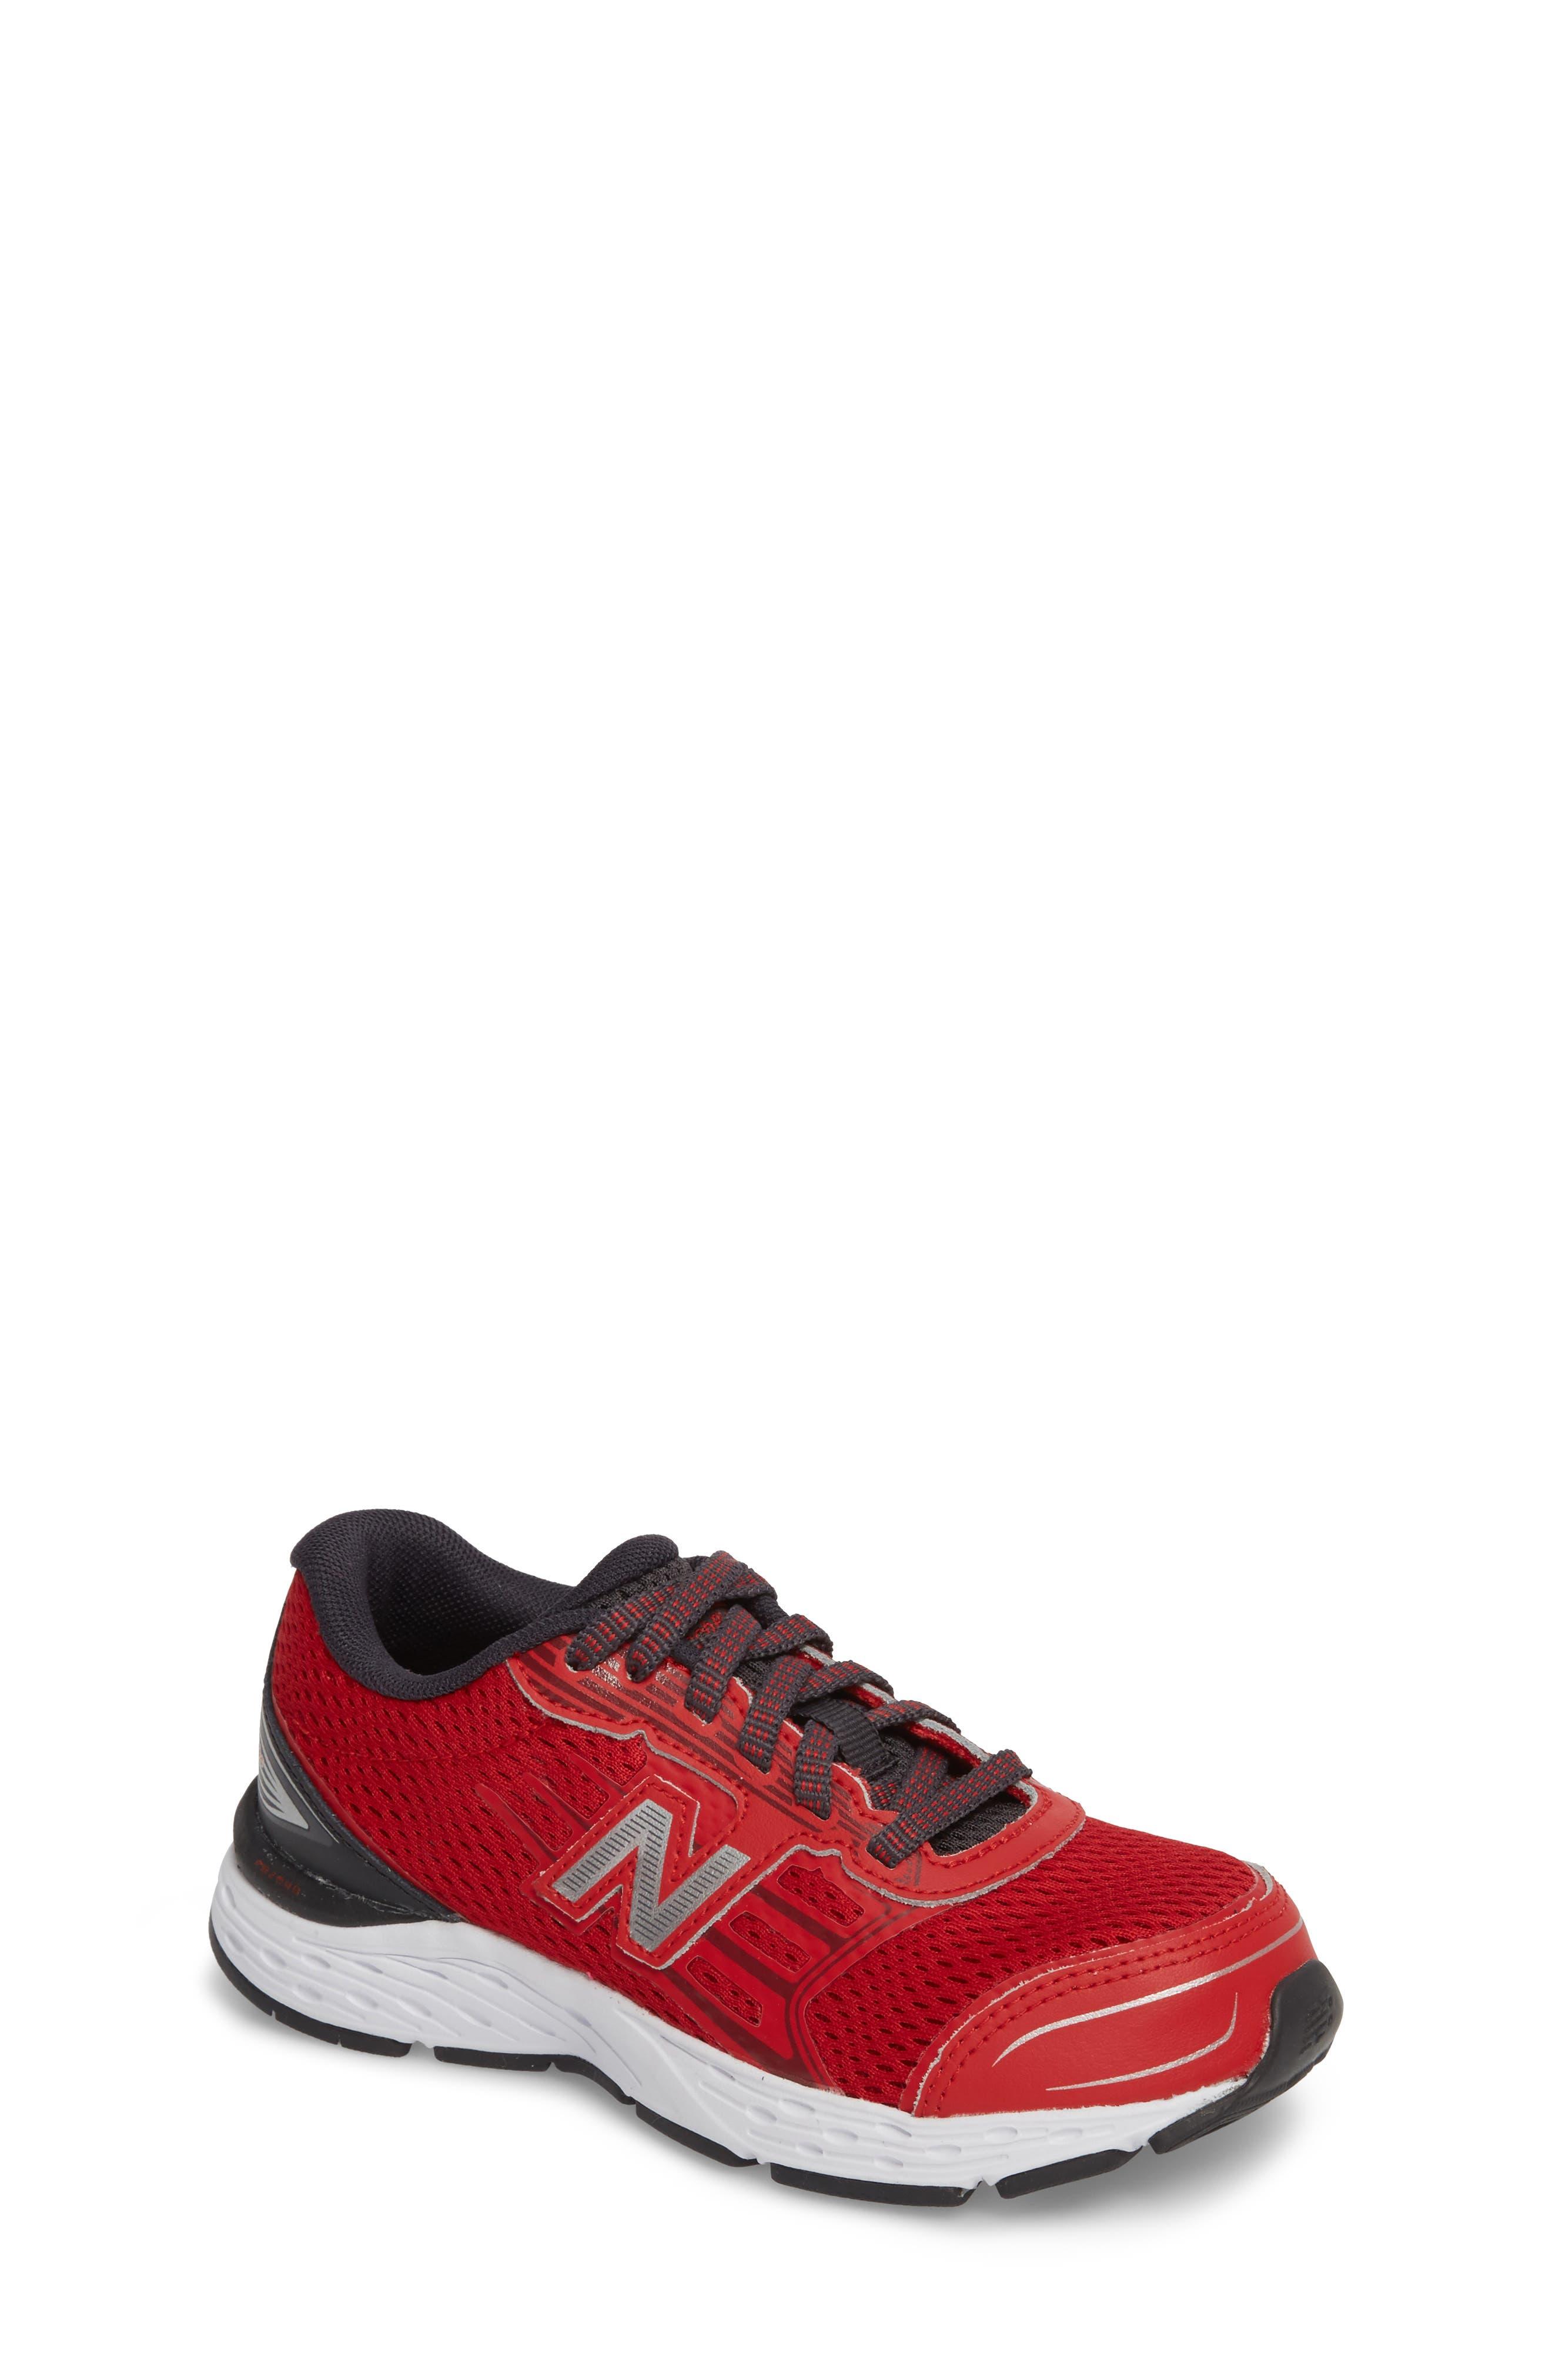 New Balance 680v5 Running Shoe (Toddler, Little Kid & Big Kid)